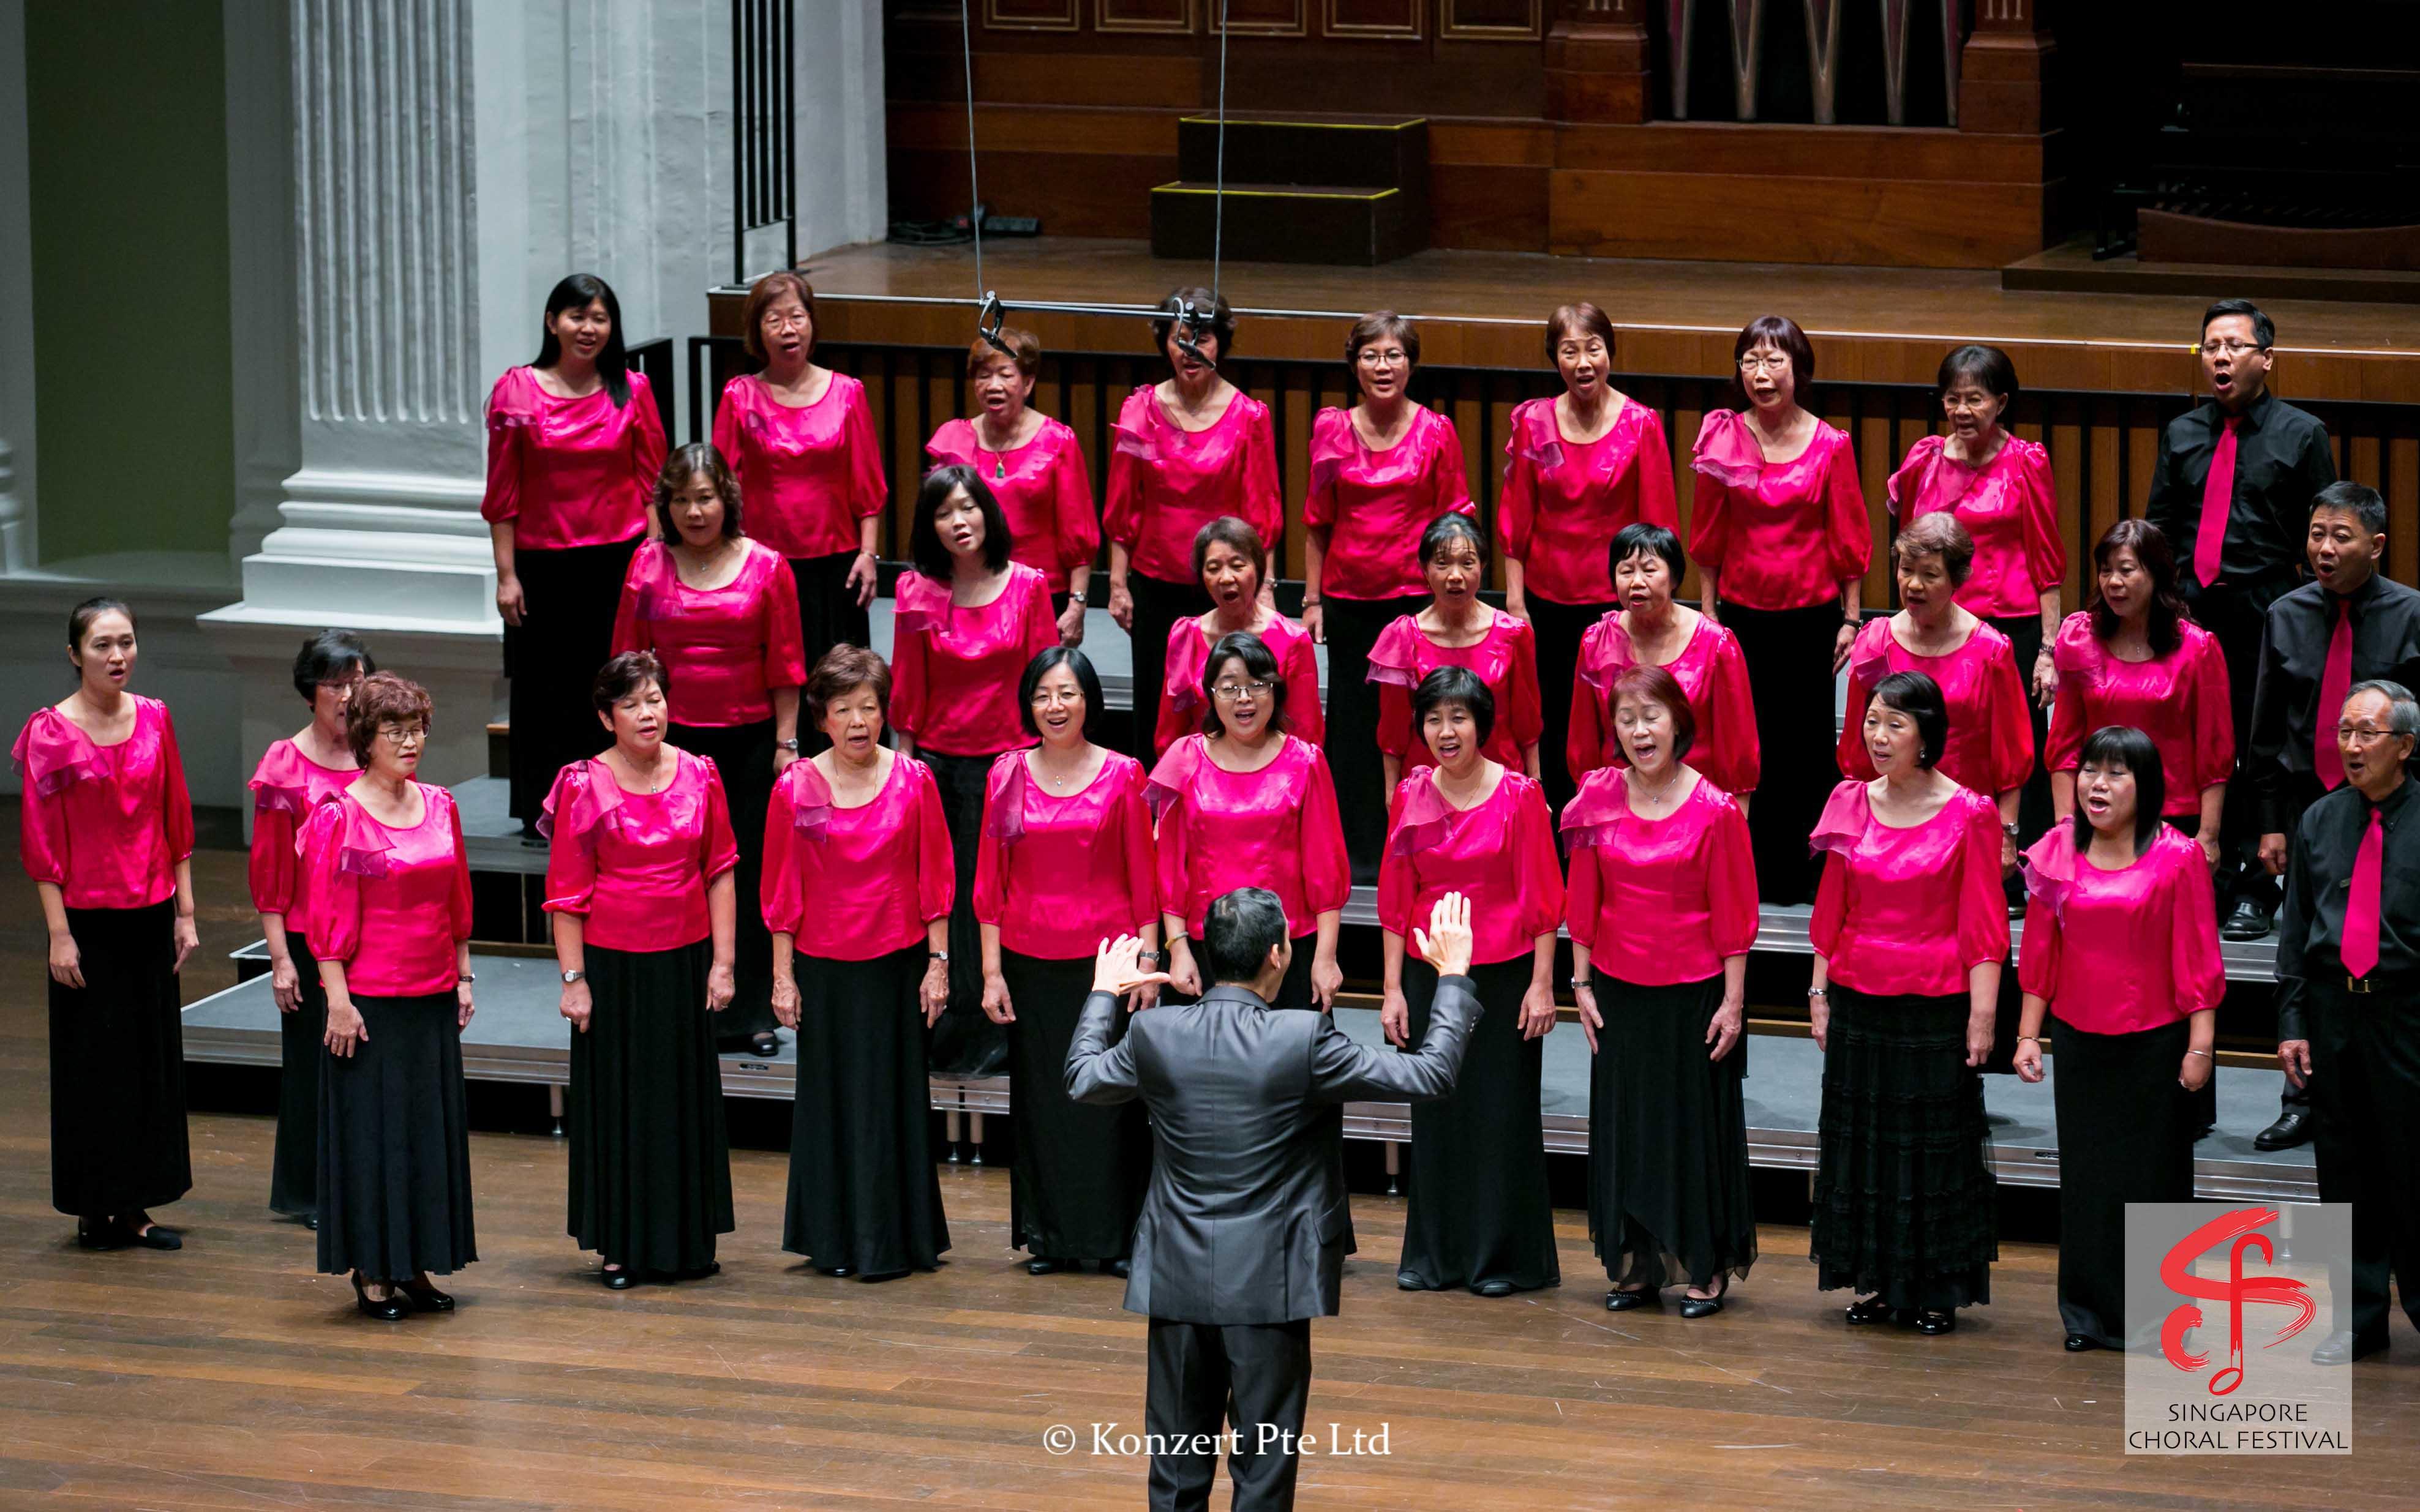 Singapore Choral Festival 7-8-15 (249).jpg